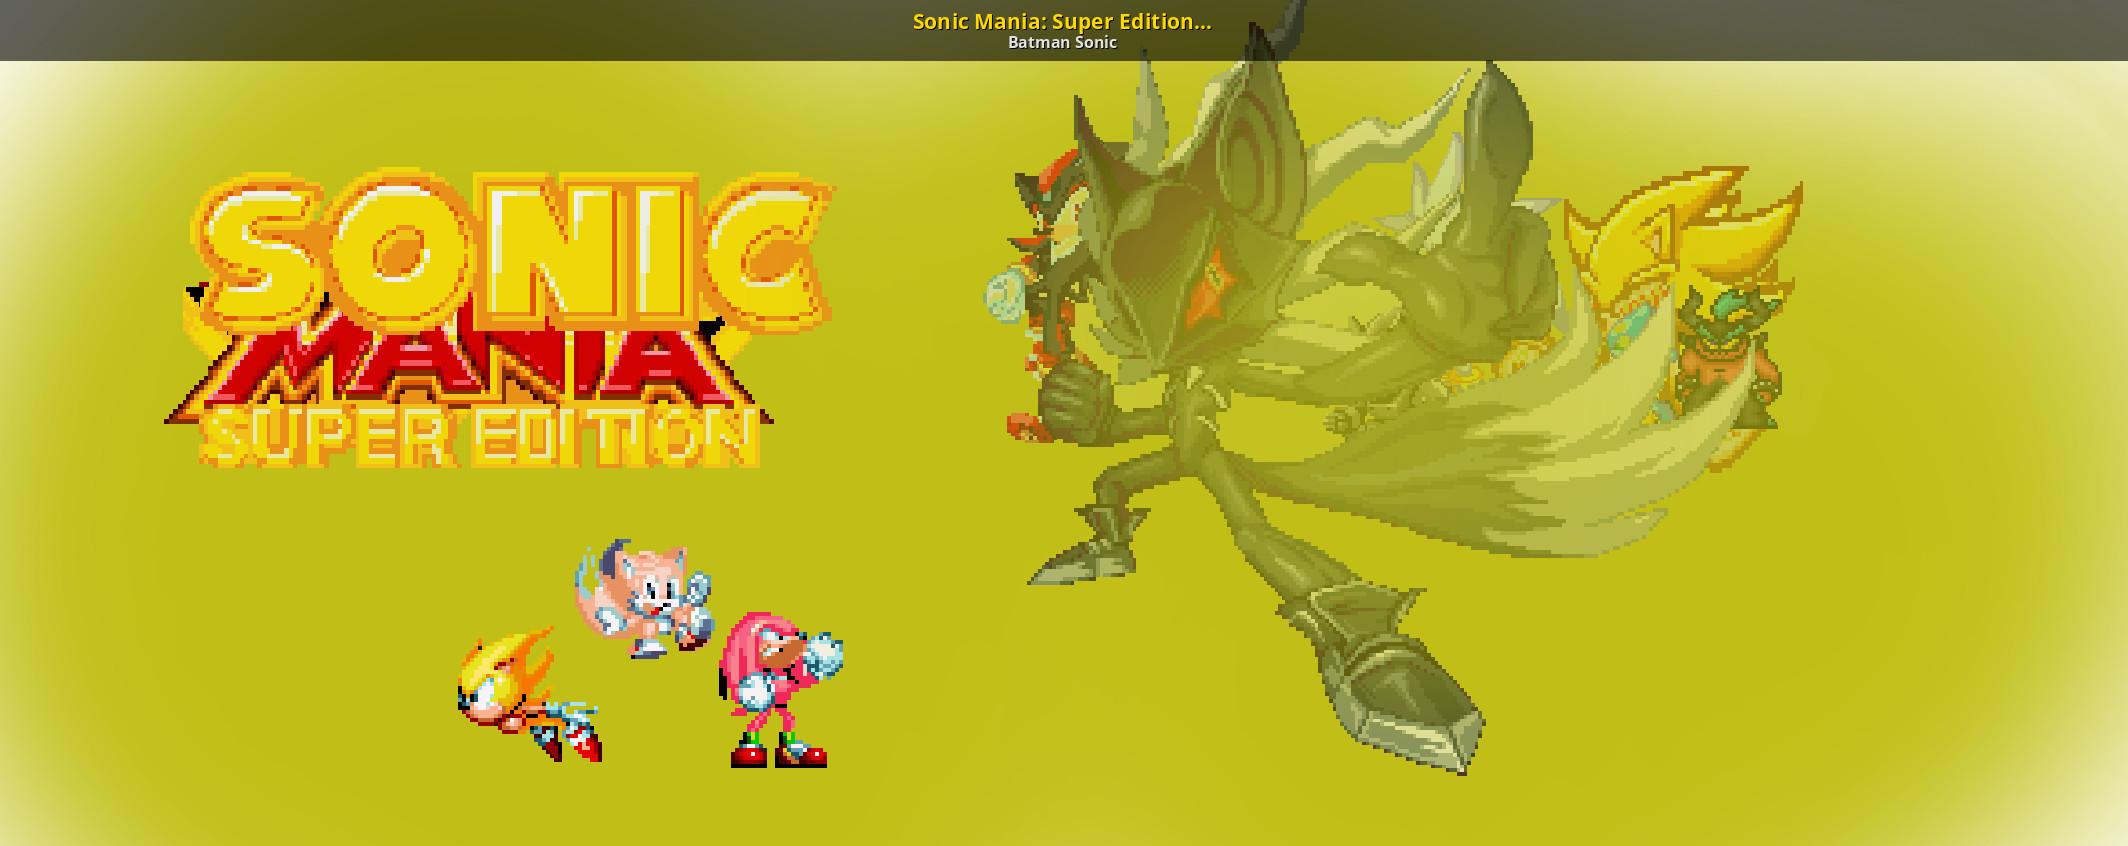 Sonic Mania: Super Edition (DEMO) [Sonic Mania] [Works In